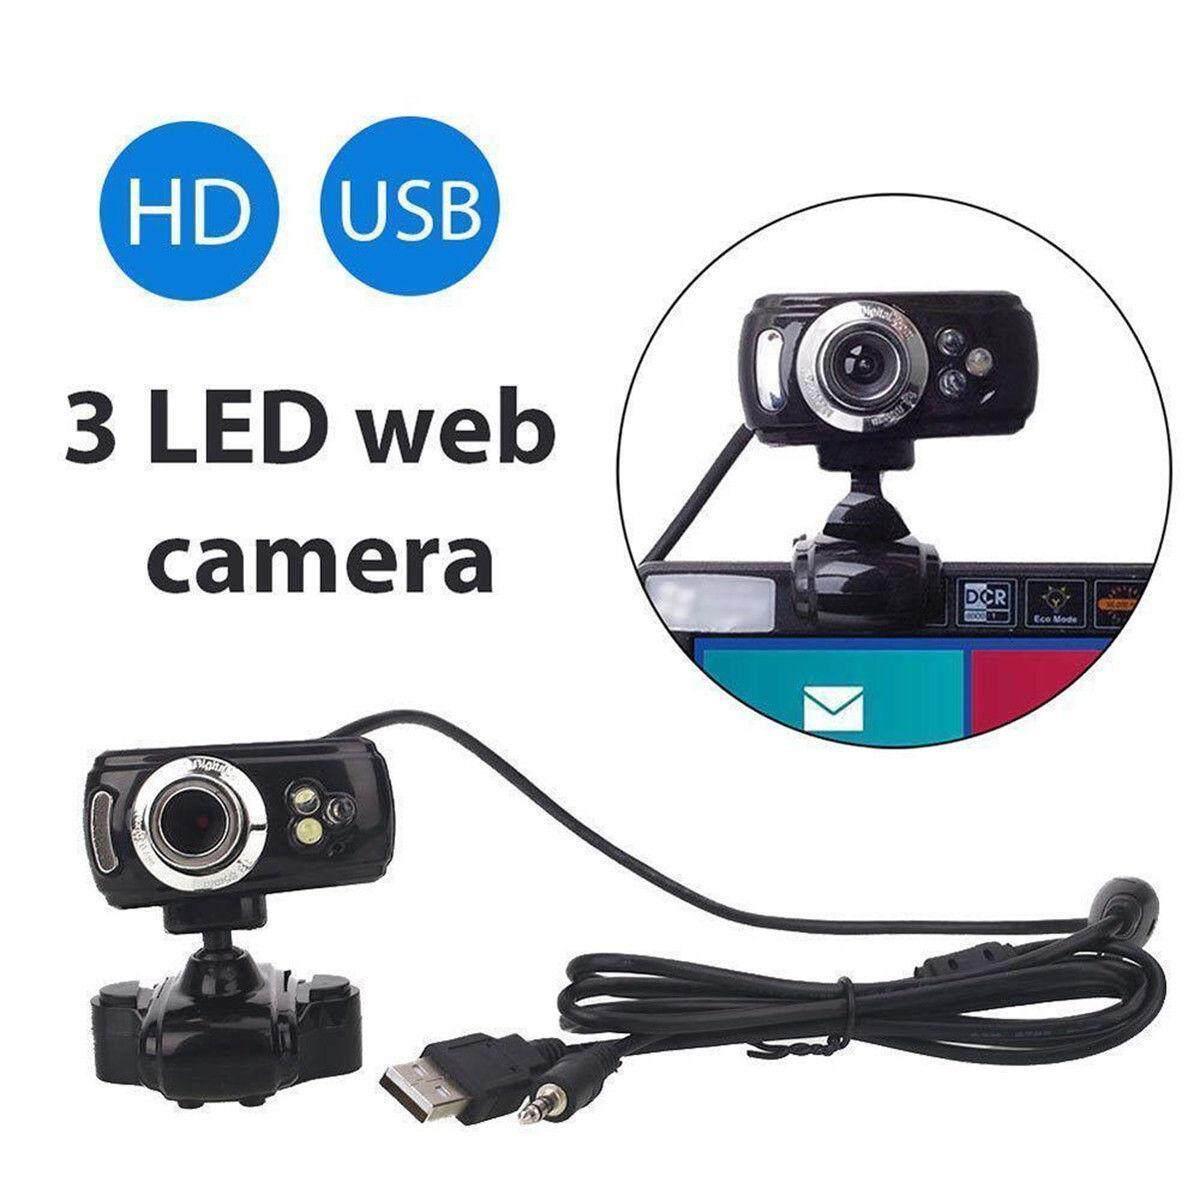 USB HD Webcam Web Camera with MIC for Computer PC Laptop Desktop